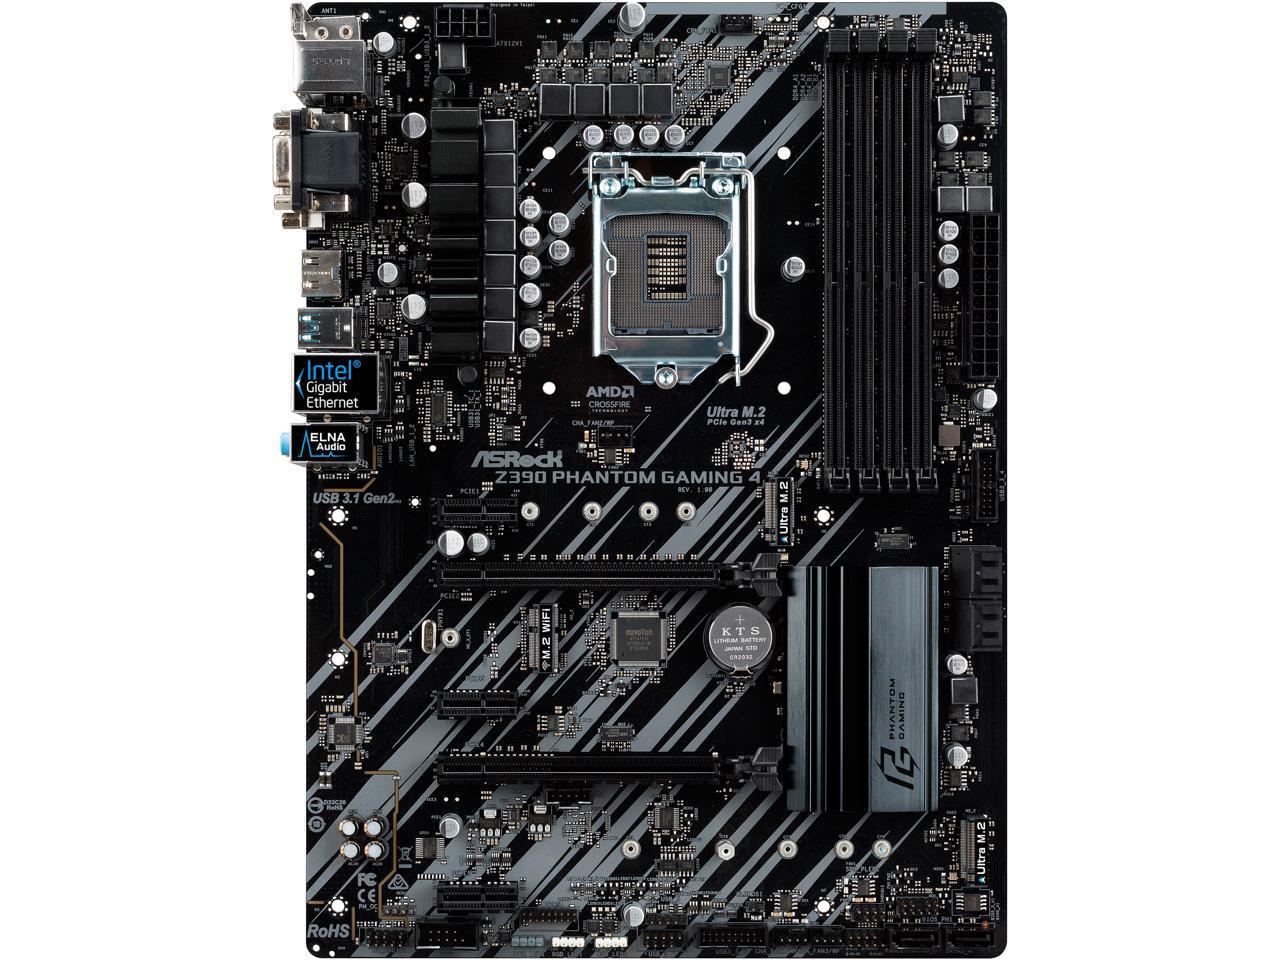 ASRock Z390 Phantom Gaming 4 LGA 1151 (300 Series) ATX Intel Motherboard - $99.99 + FS